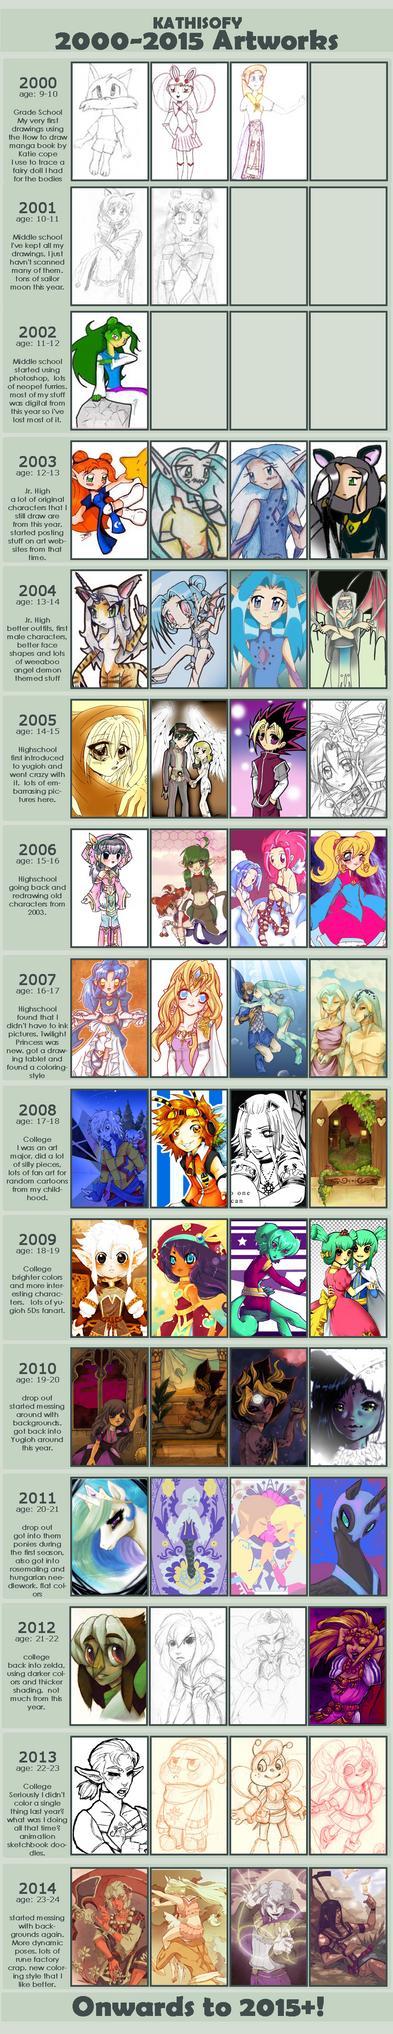 [MEME] Improvement 2000- 2015 by Kathisofy